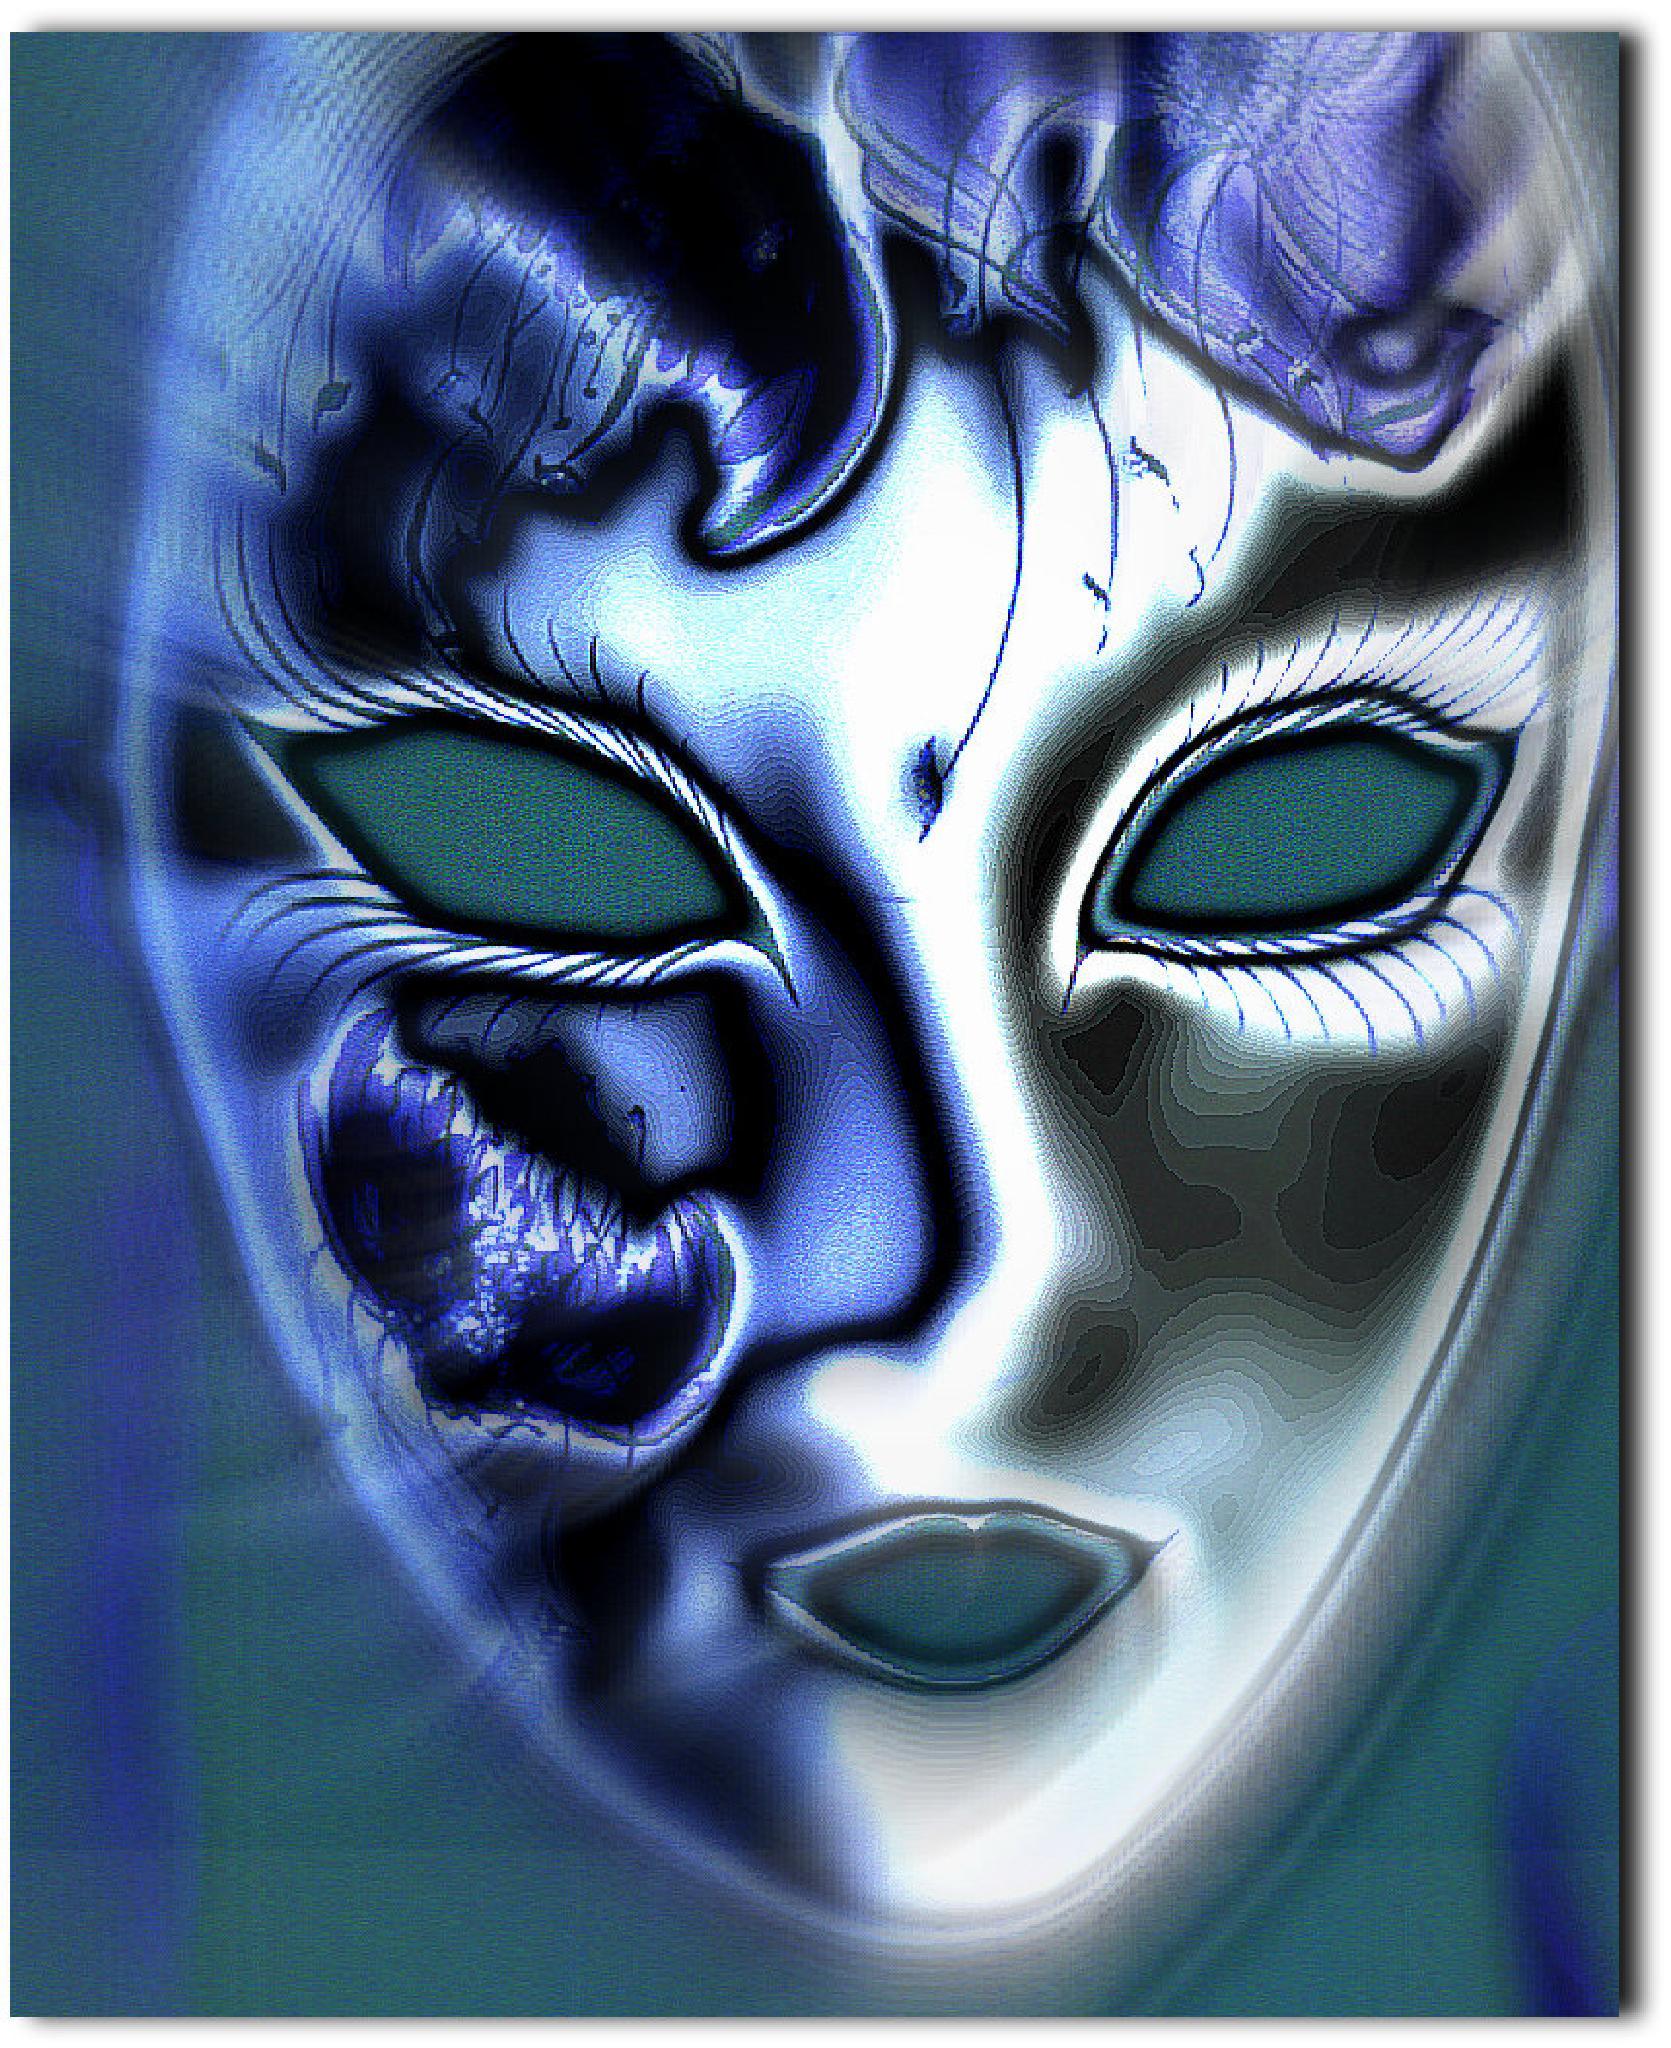 Mask 201 by mpross1